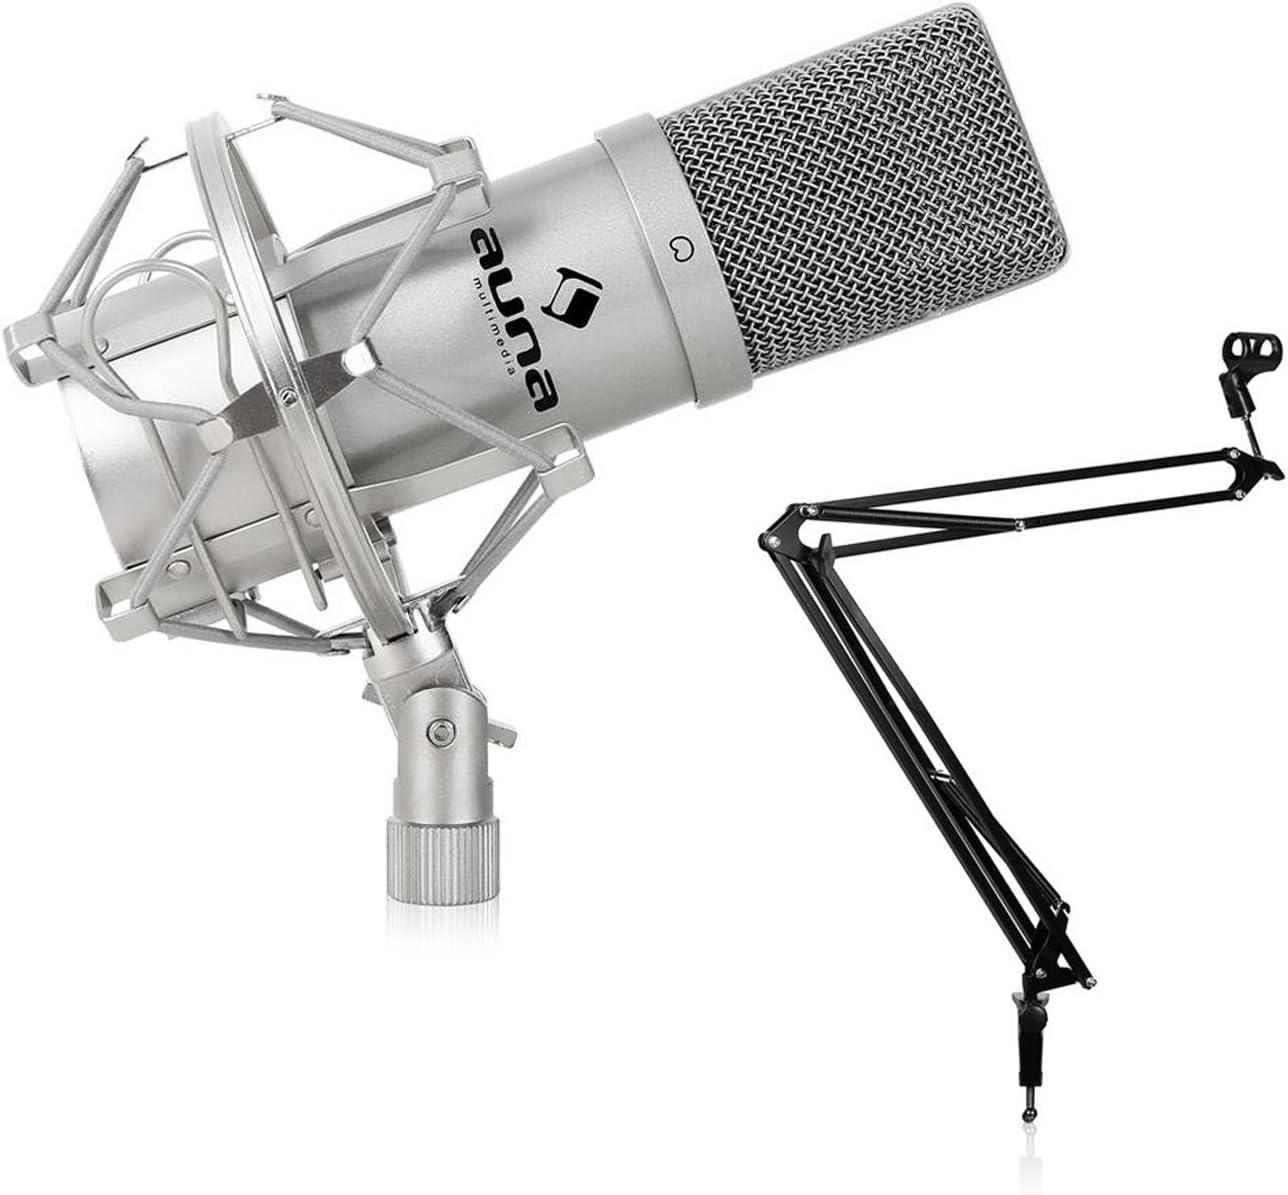 voix et chant avec micro USB Auna MIC-900 et support Set complet pour streaming podcast argent Podcast Pack